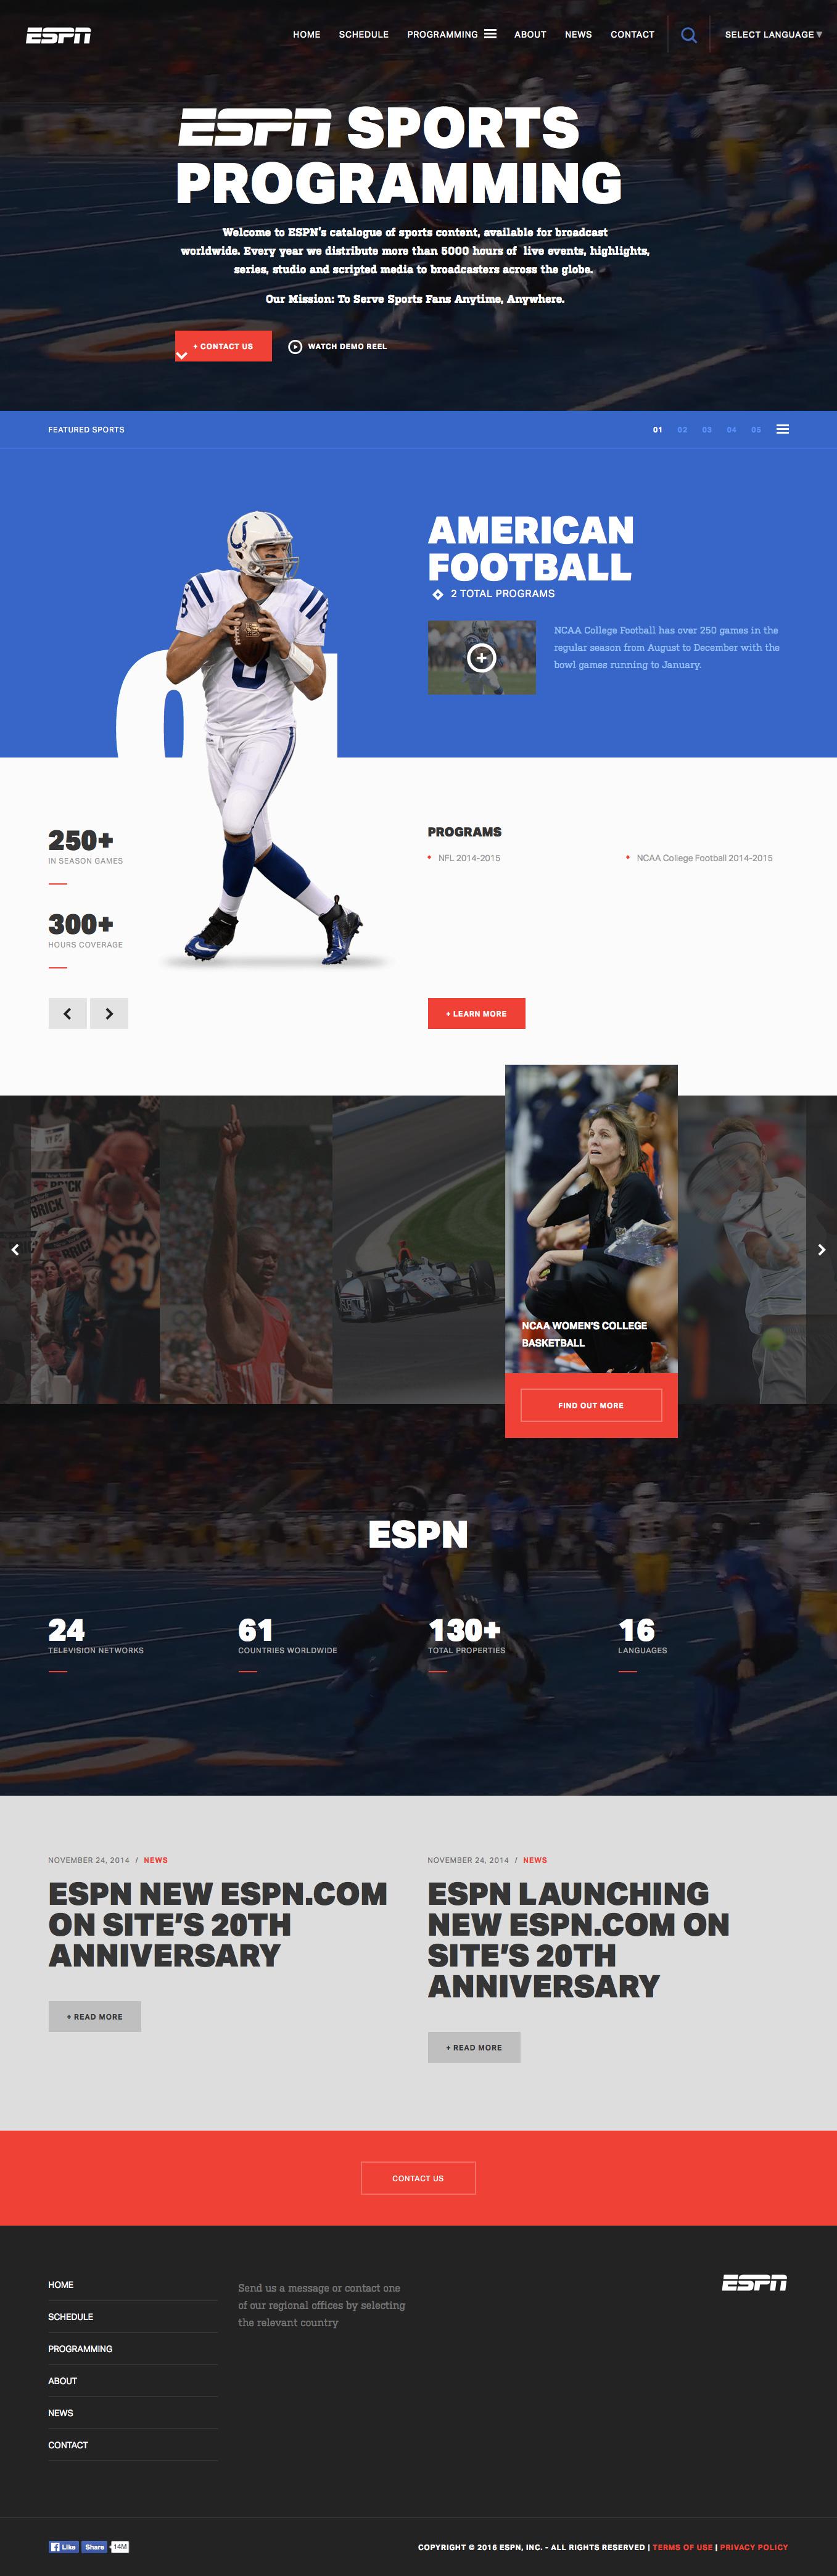 ESPN-Sports-Programming